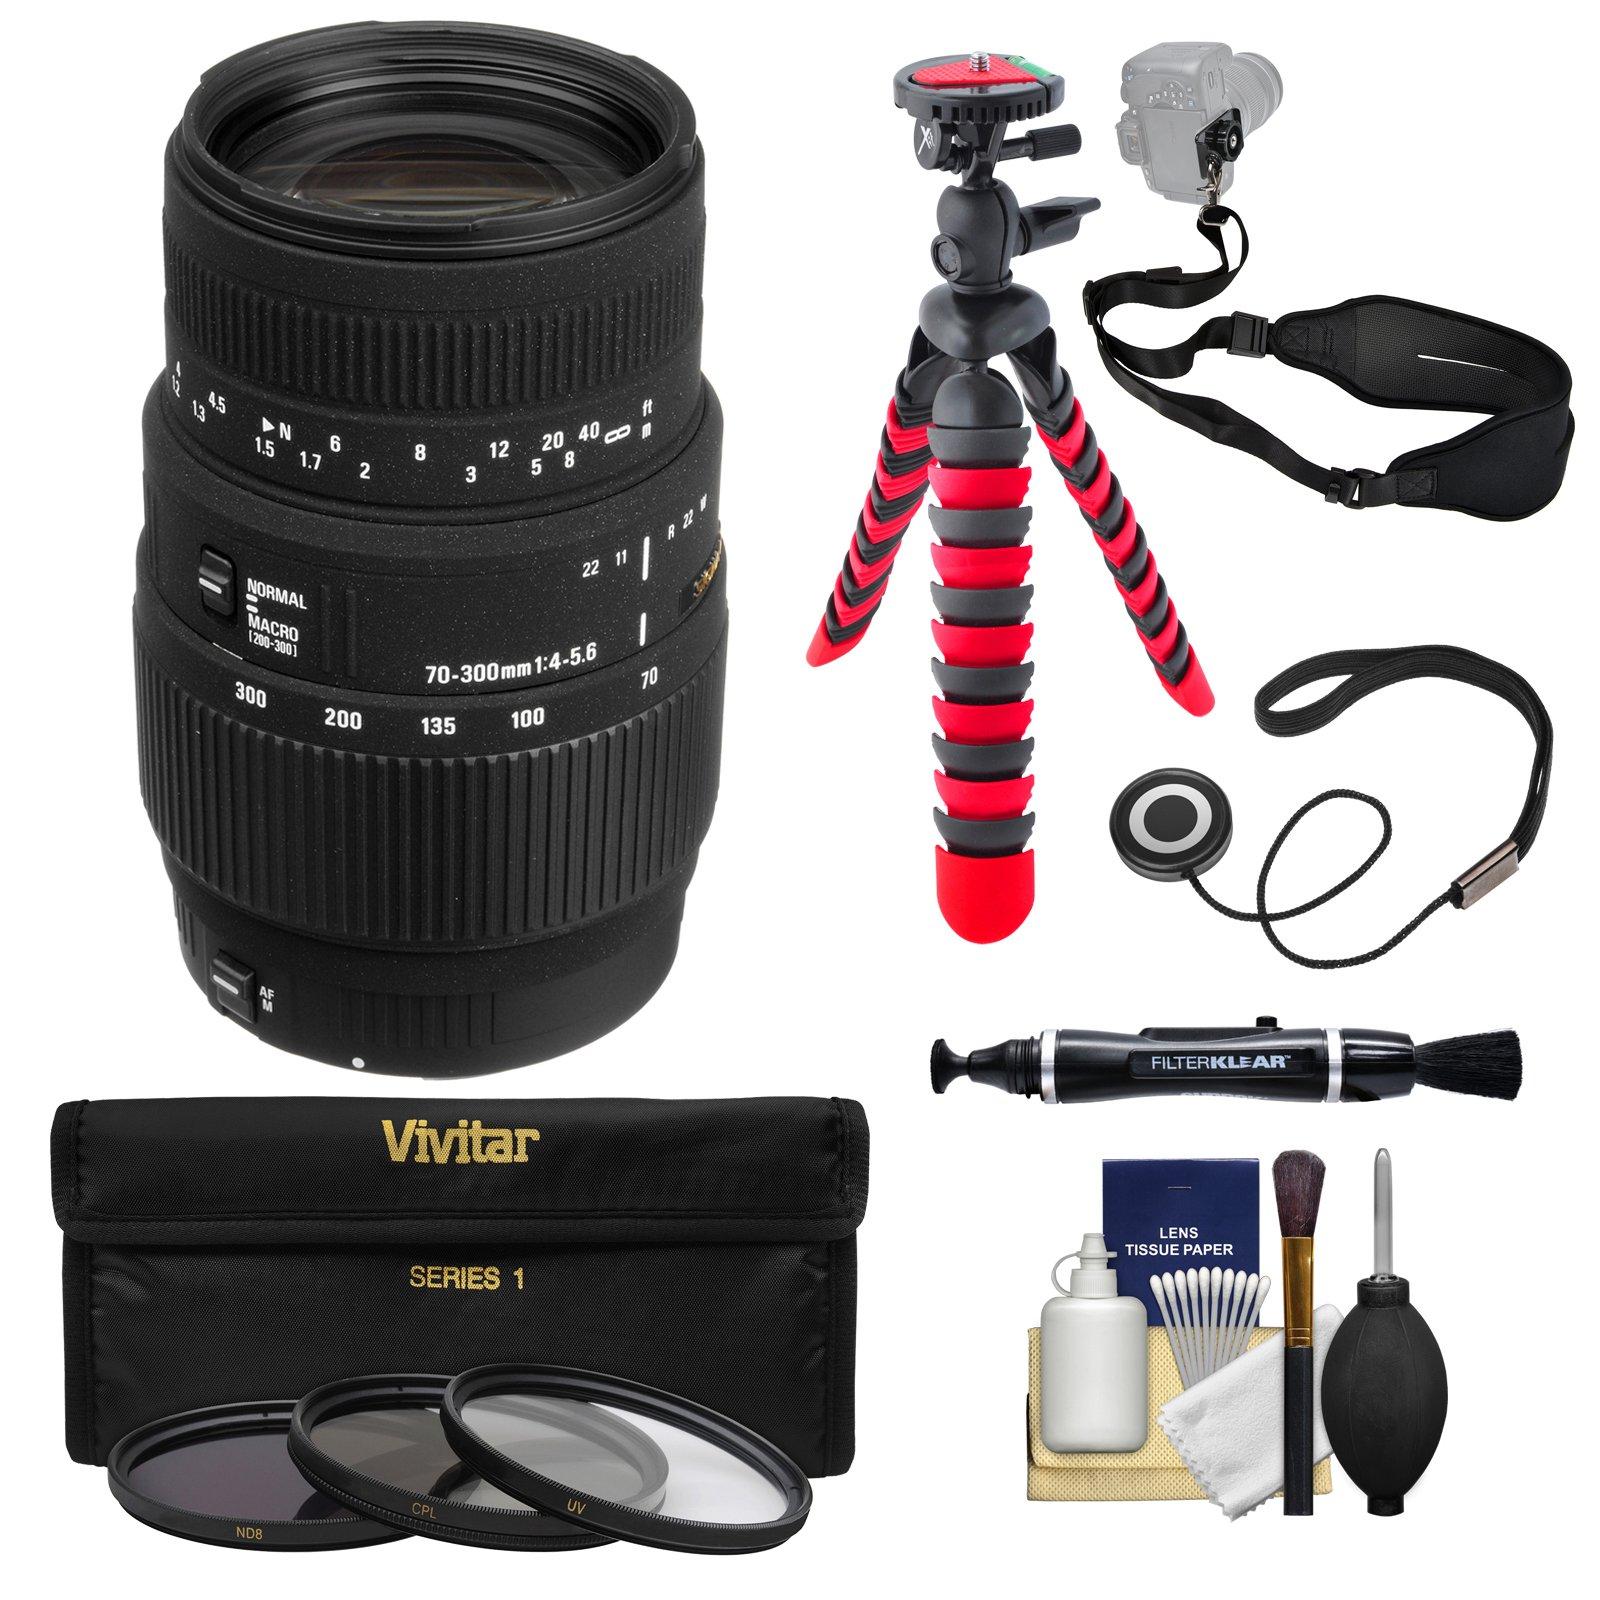 Sigma 70-300mm f/4-5.6 DG Motorized Macro Zoom Lens with Tripod + Filter + Strap + Kit for Nikon Digital SLR Cameras by Sigma